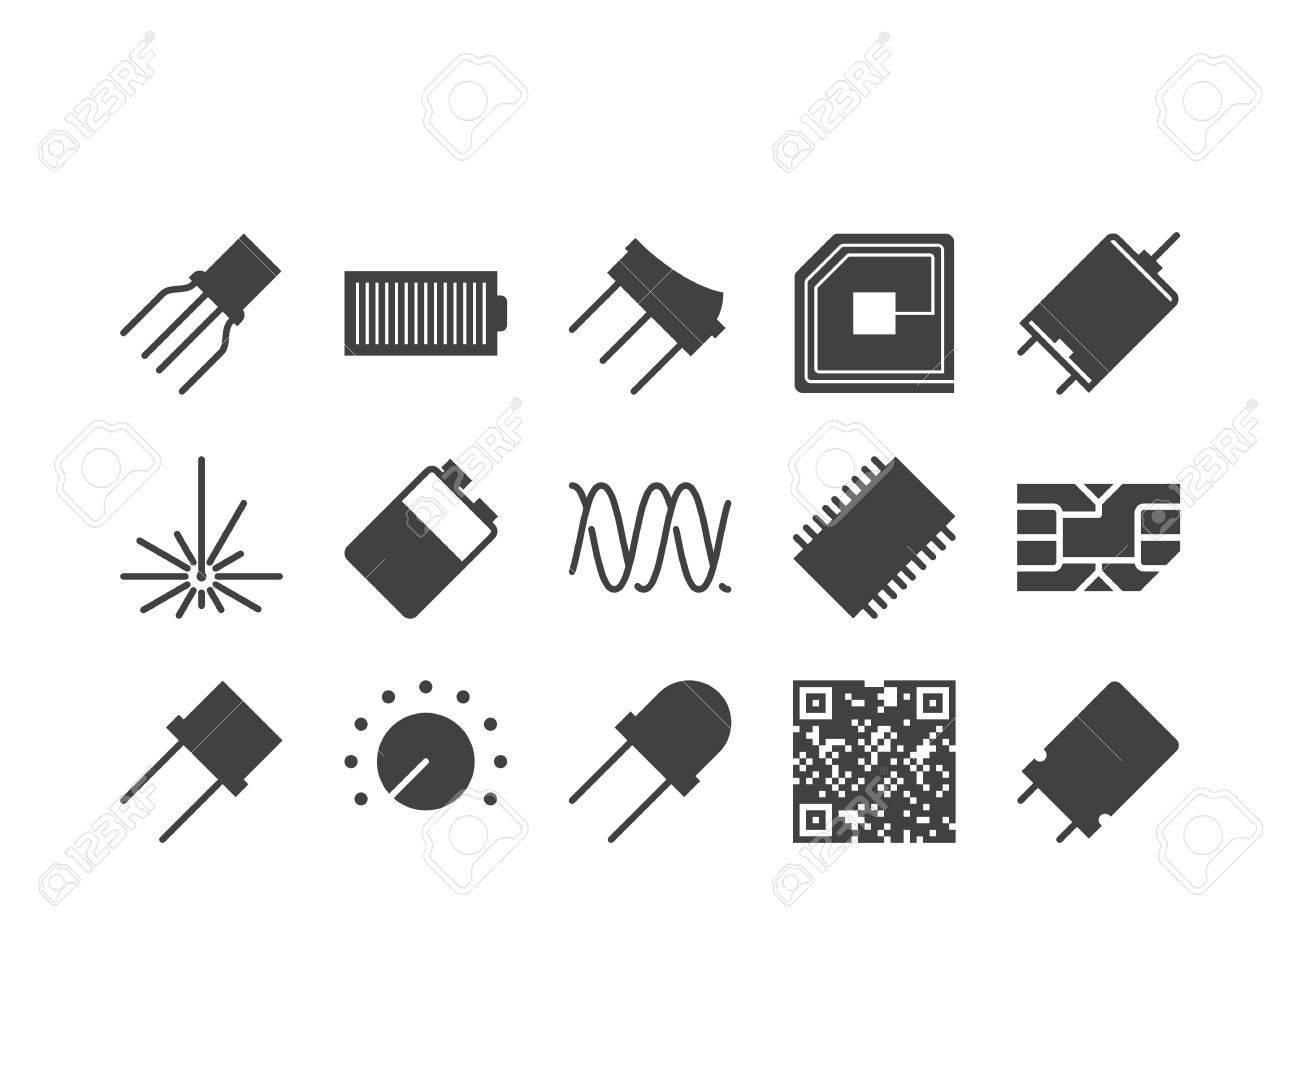 Circuit Diagram Outline Icons Set Royalty Free Cliparts Vectors